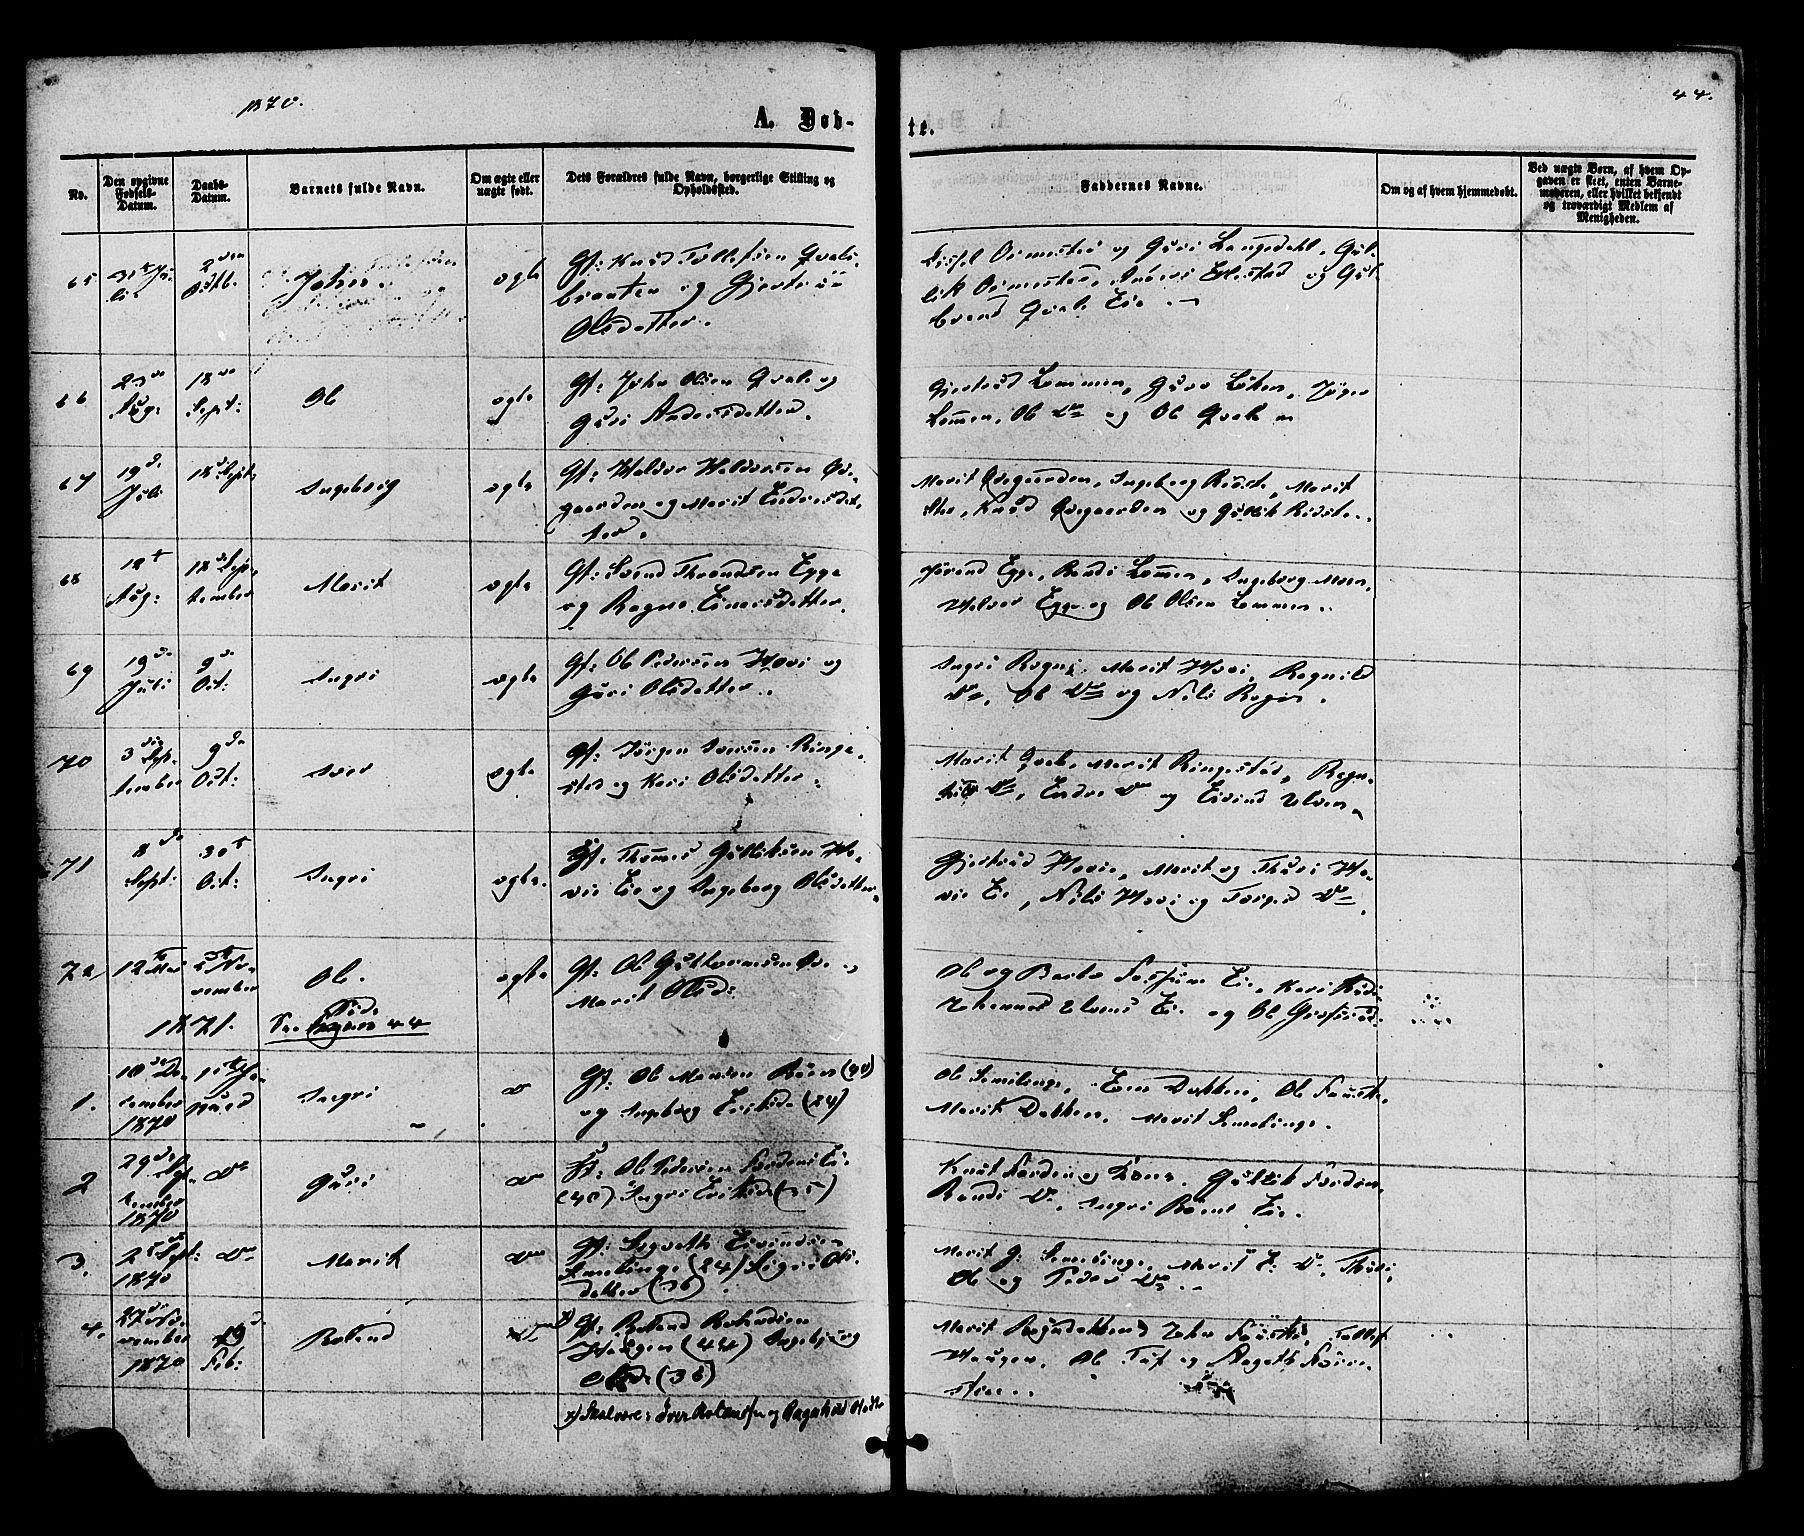 SAH, Vestre Slidre prestekontor, Ministerialbok nr. 3, 1865-1880, s. 44